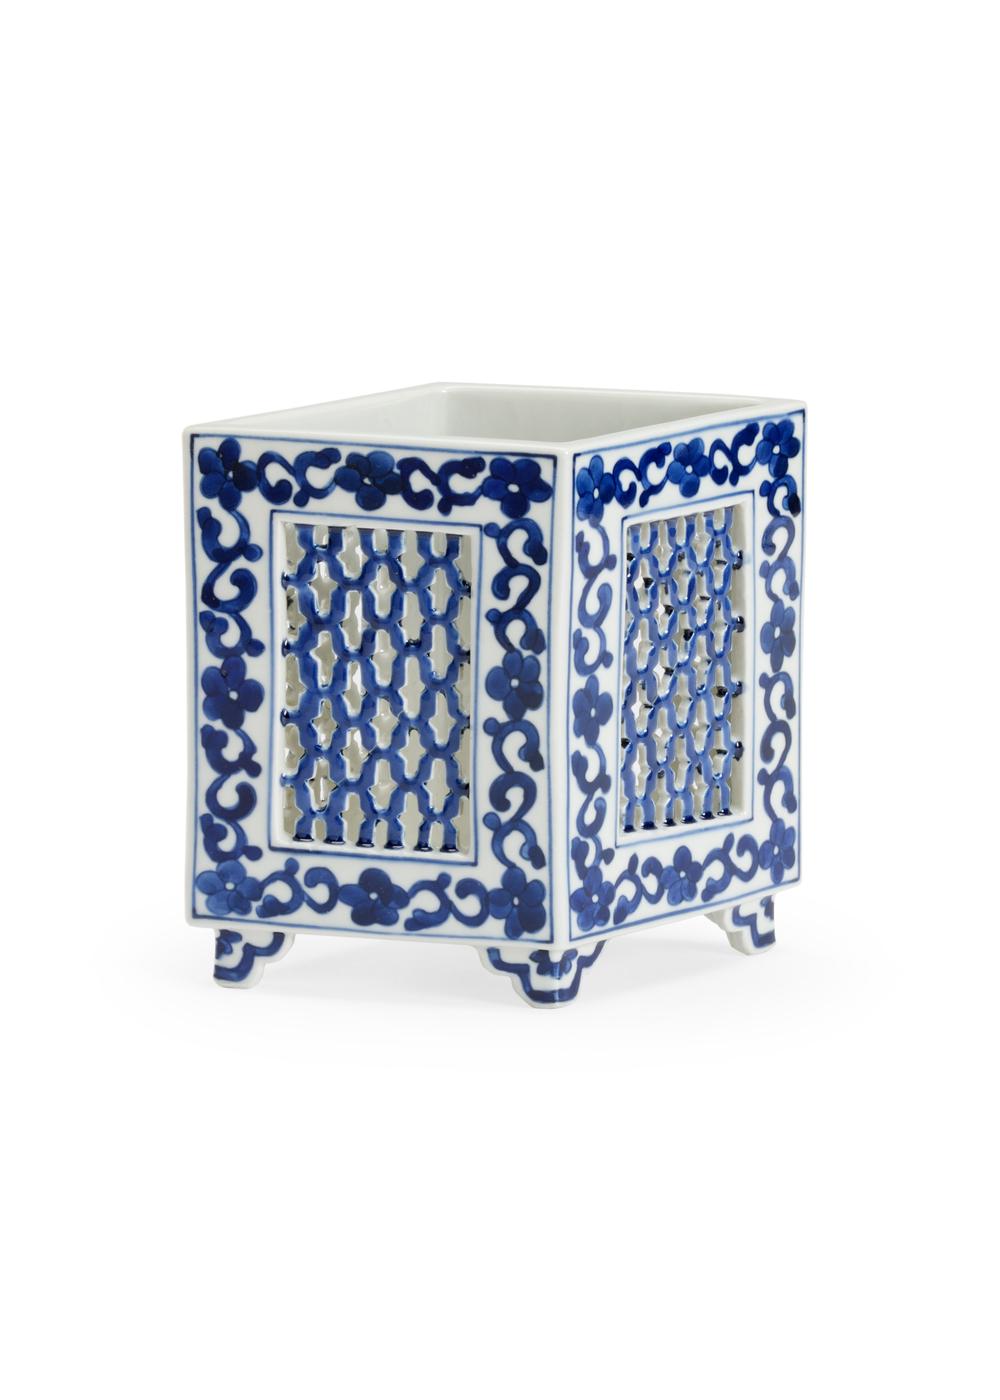 Chelsea House - Pierced Blue and White Large Vase